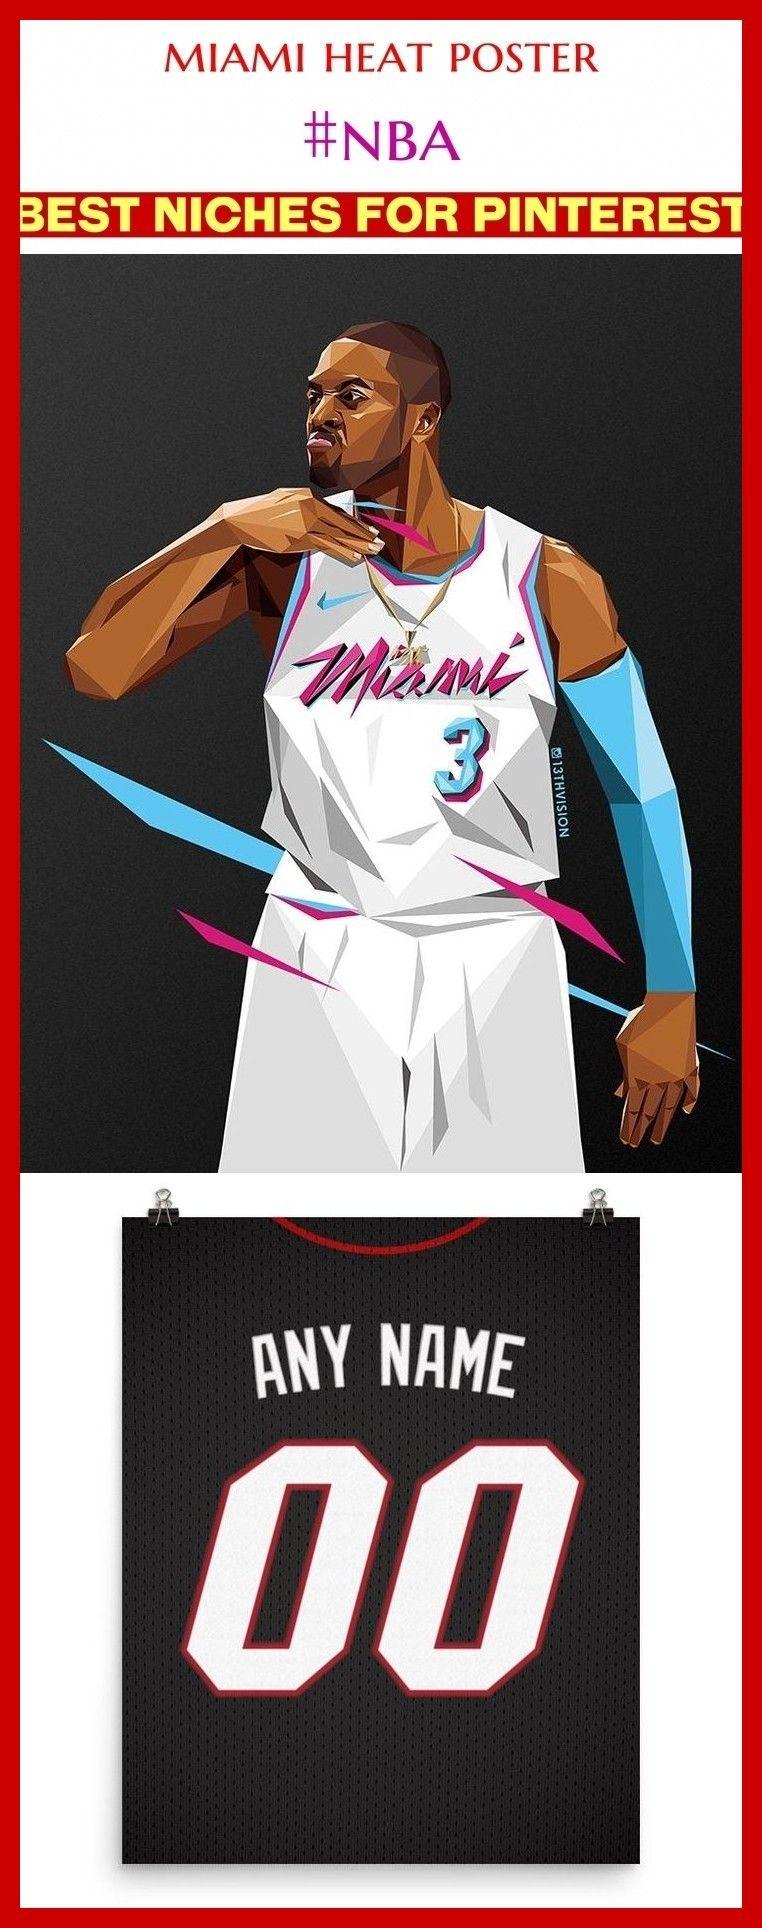 Miami Heat Poster Nba Seo Blog Niches Sports Miami Heat Wallpapers Miami In 2020 Miami Heat Logo Miami Heat Miami Heat Basketball